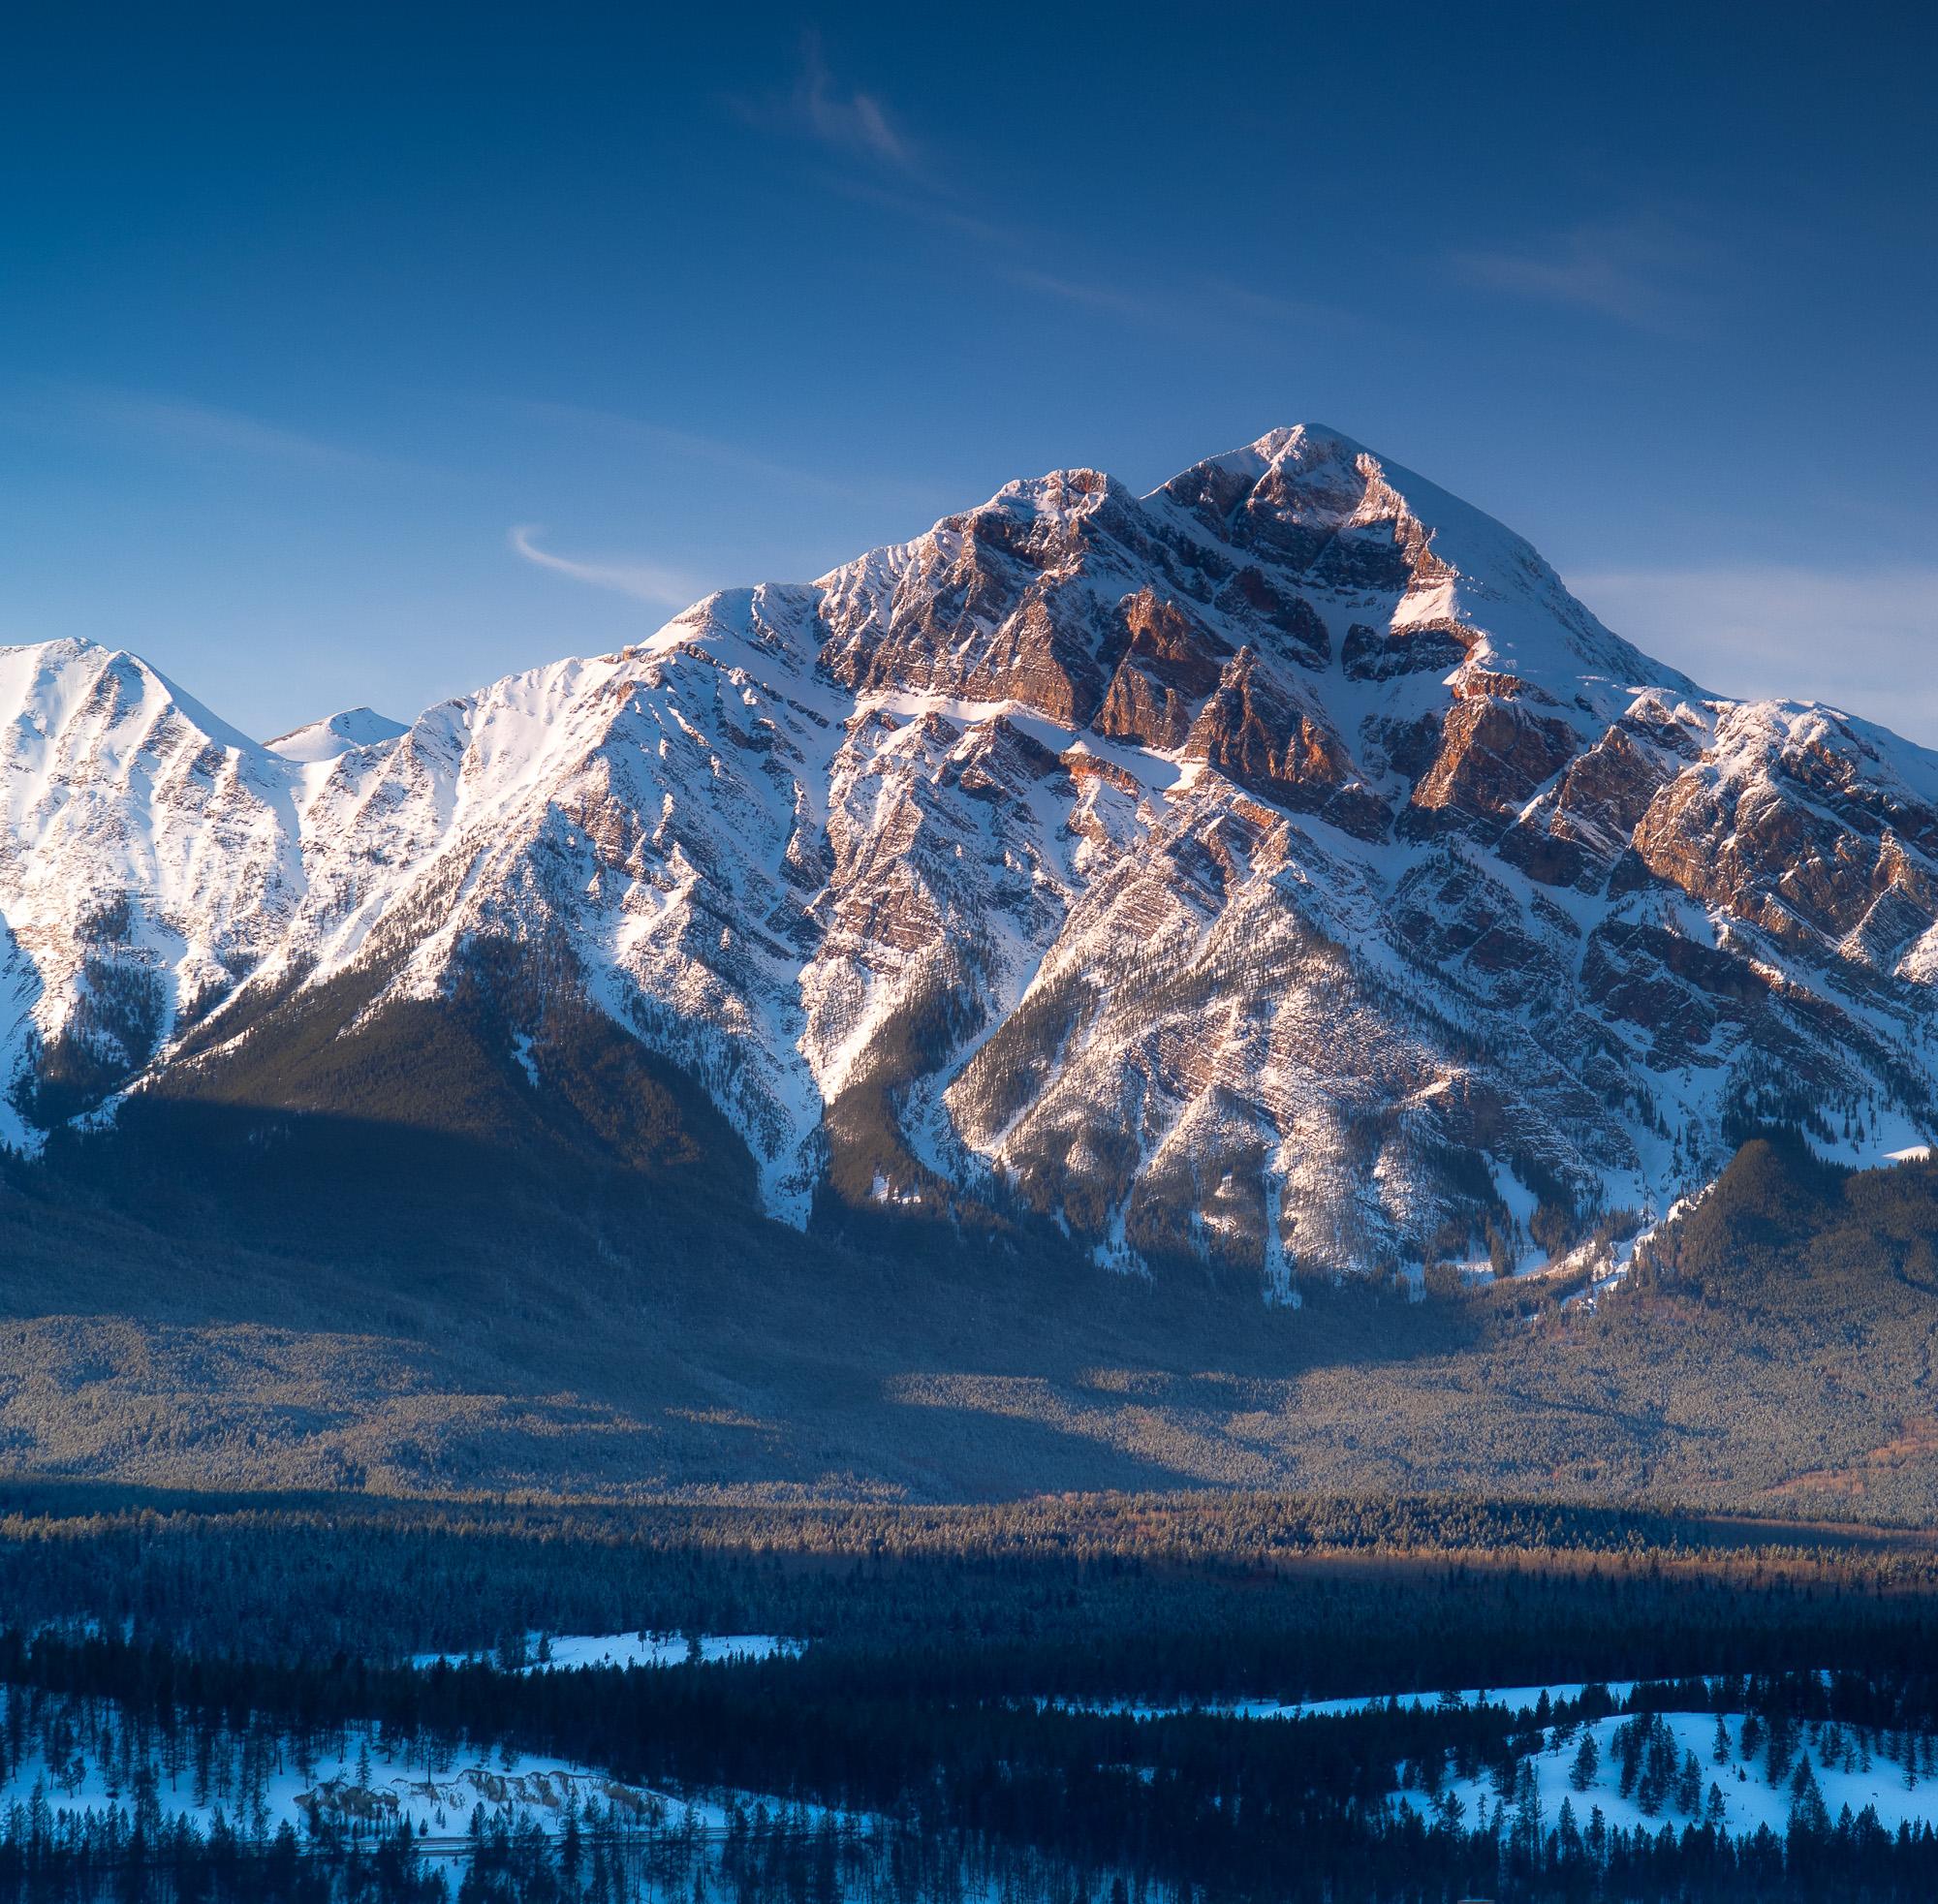 0001 Pyramid Mountain in Winter.jpg